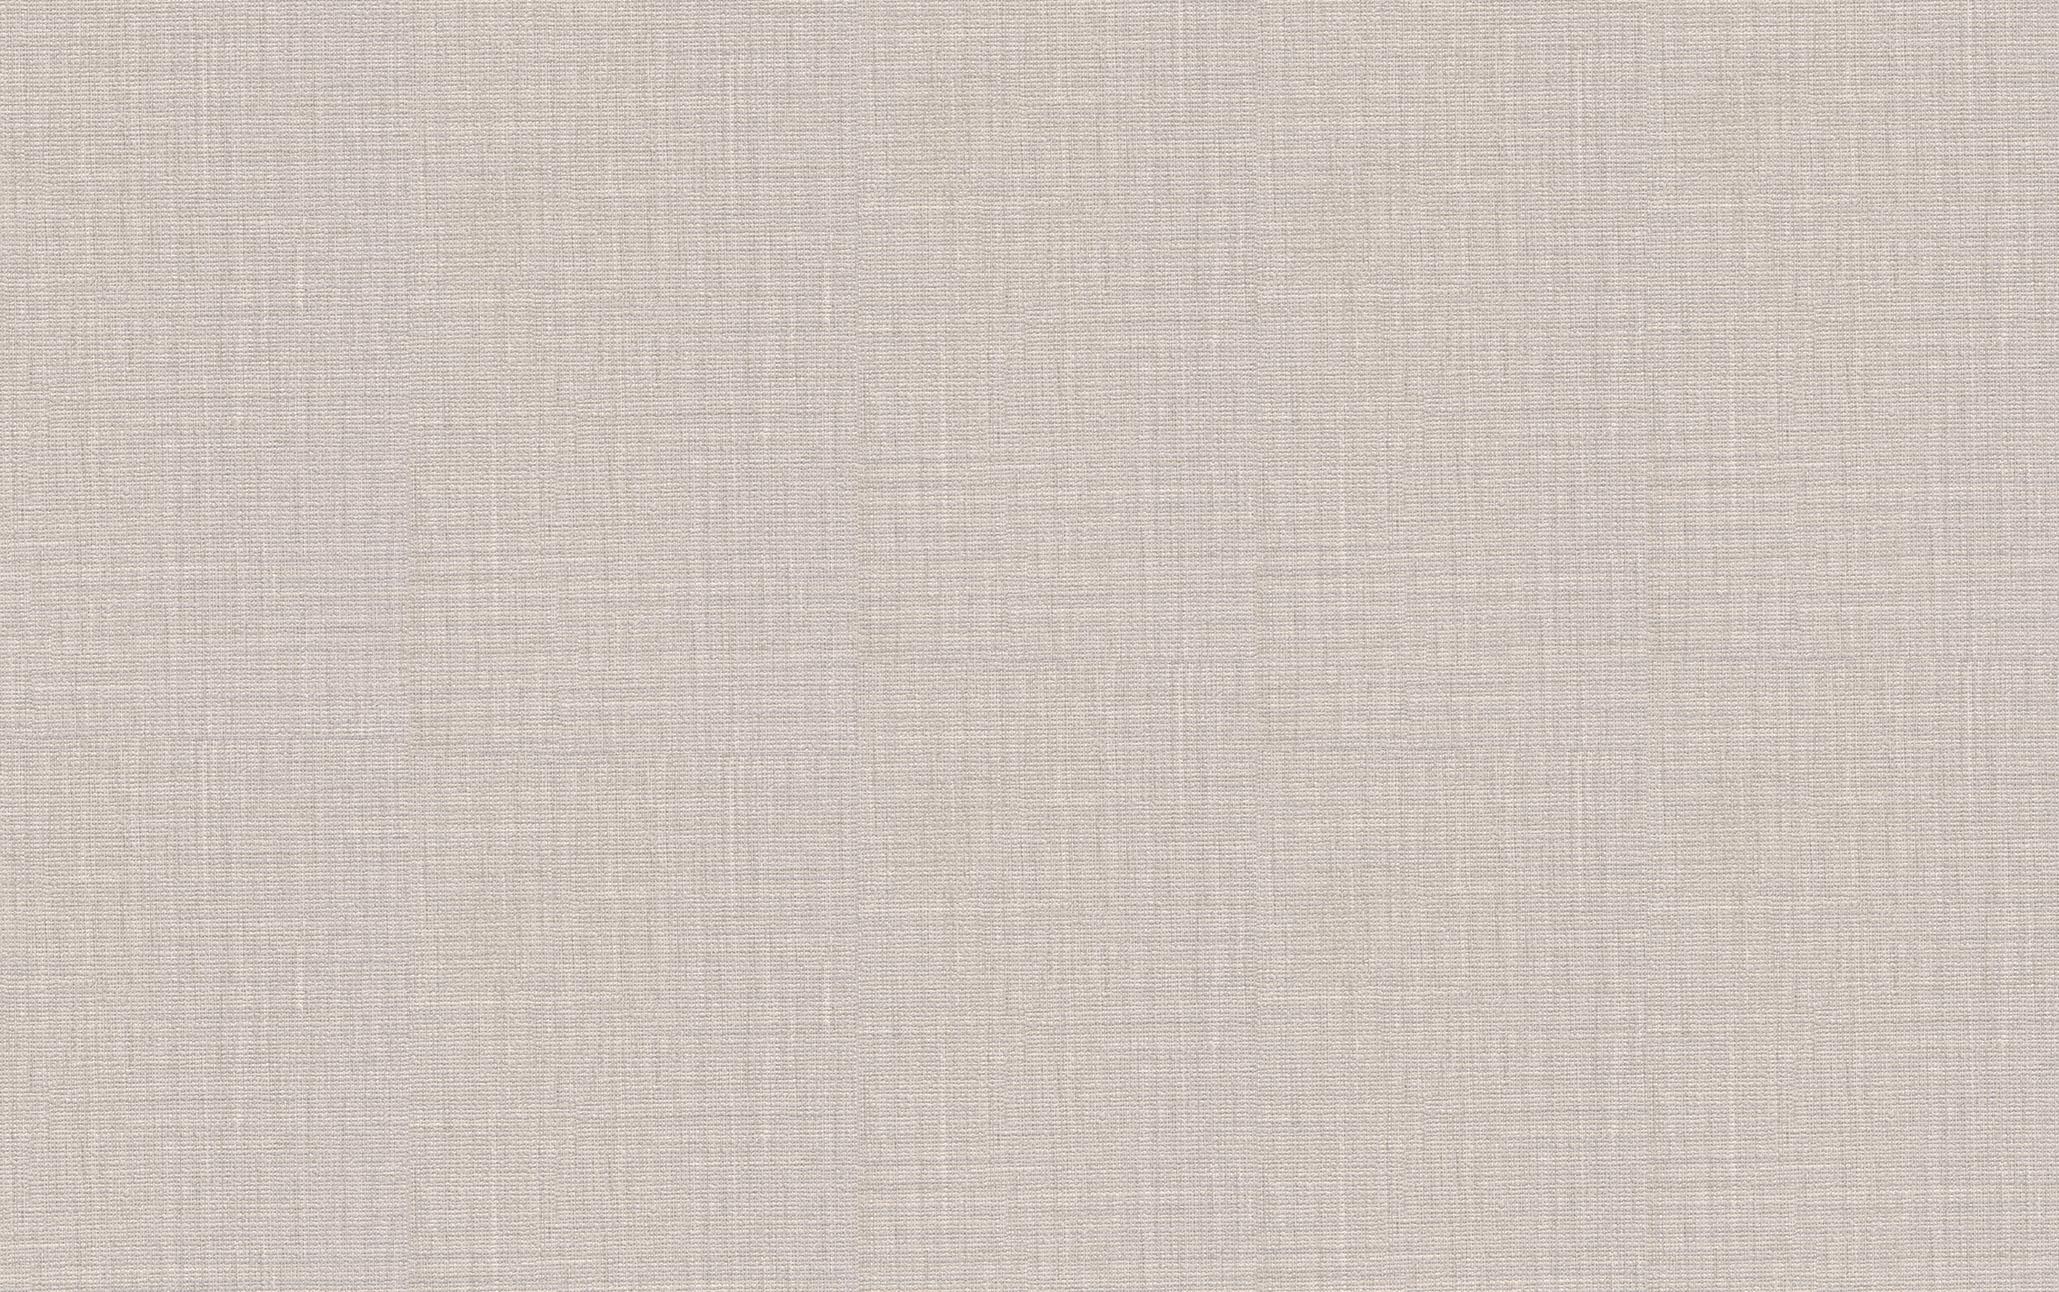 Winter Wheat - LJC5003